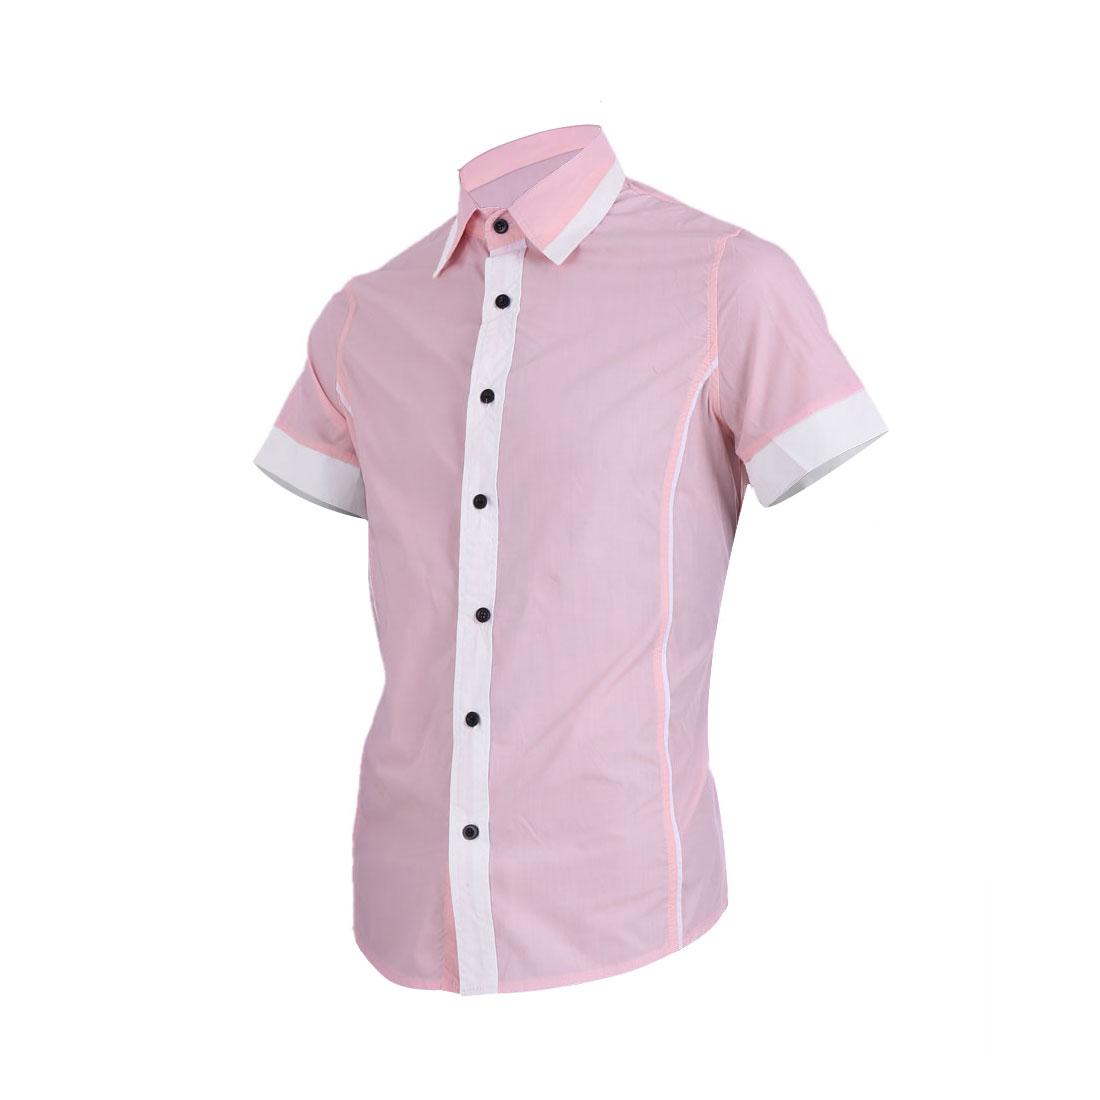 Men Short Sleeve Single Breasted Slim Fit Light Pink Shirt M